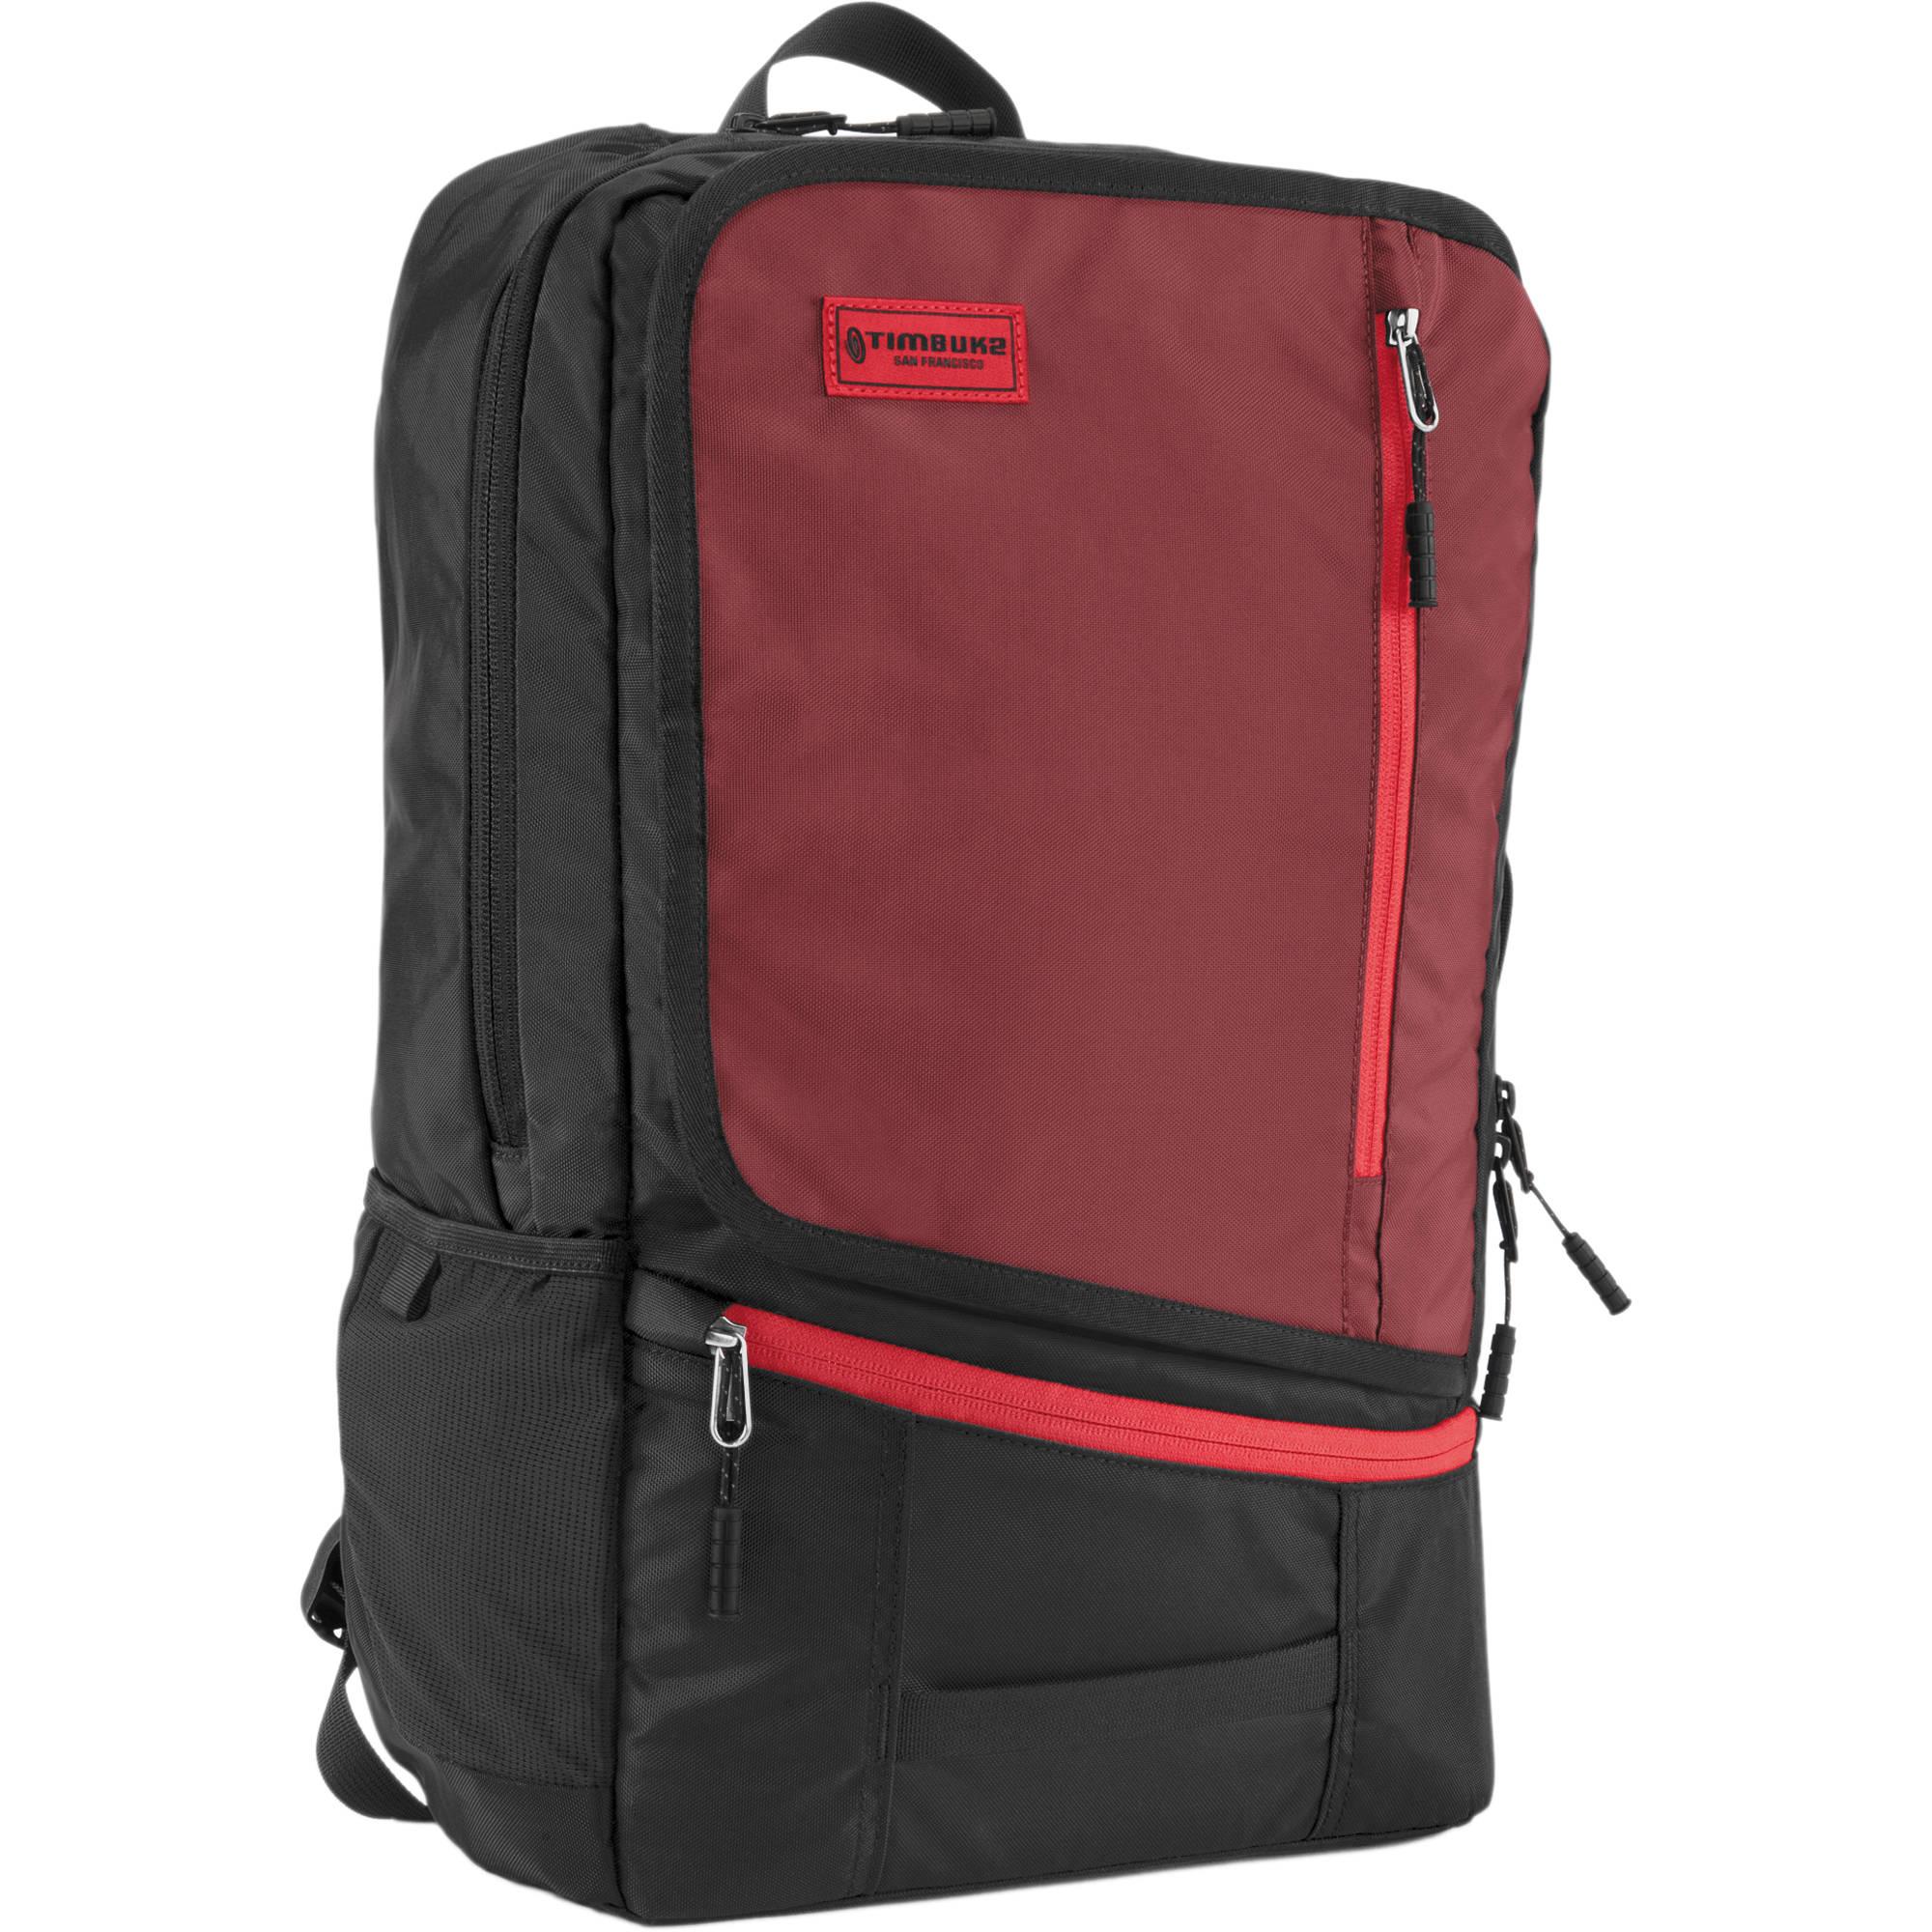 9c1205844c5 Timbuk2 Q Laptop Backpack 2014 (Diablo) 396-3-6061 B H Photo